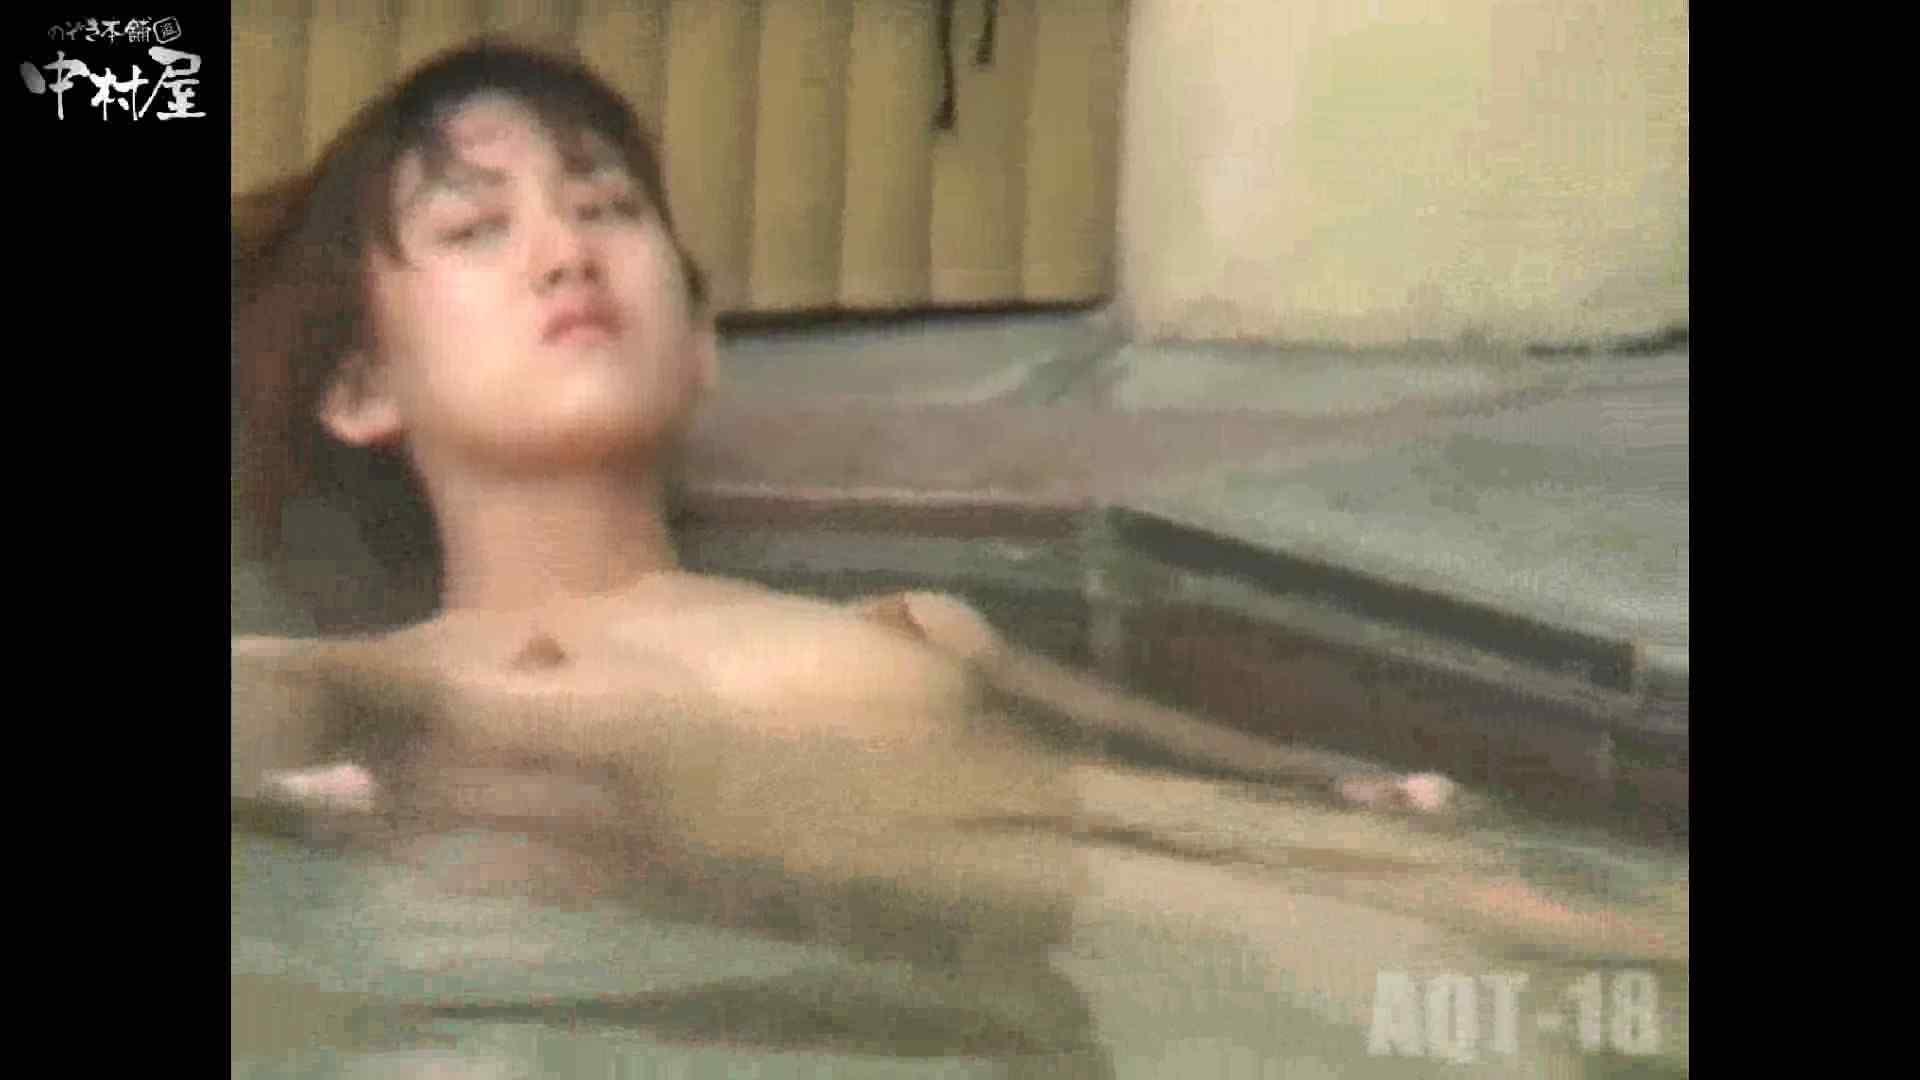 Aquaな露天風呂Vol.882潜入盗撮露天風呂十八判湯 其の七 潜入   OLセックス  84画像 65